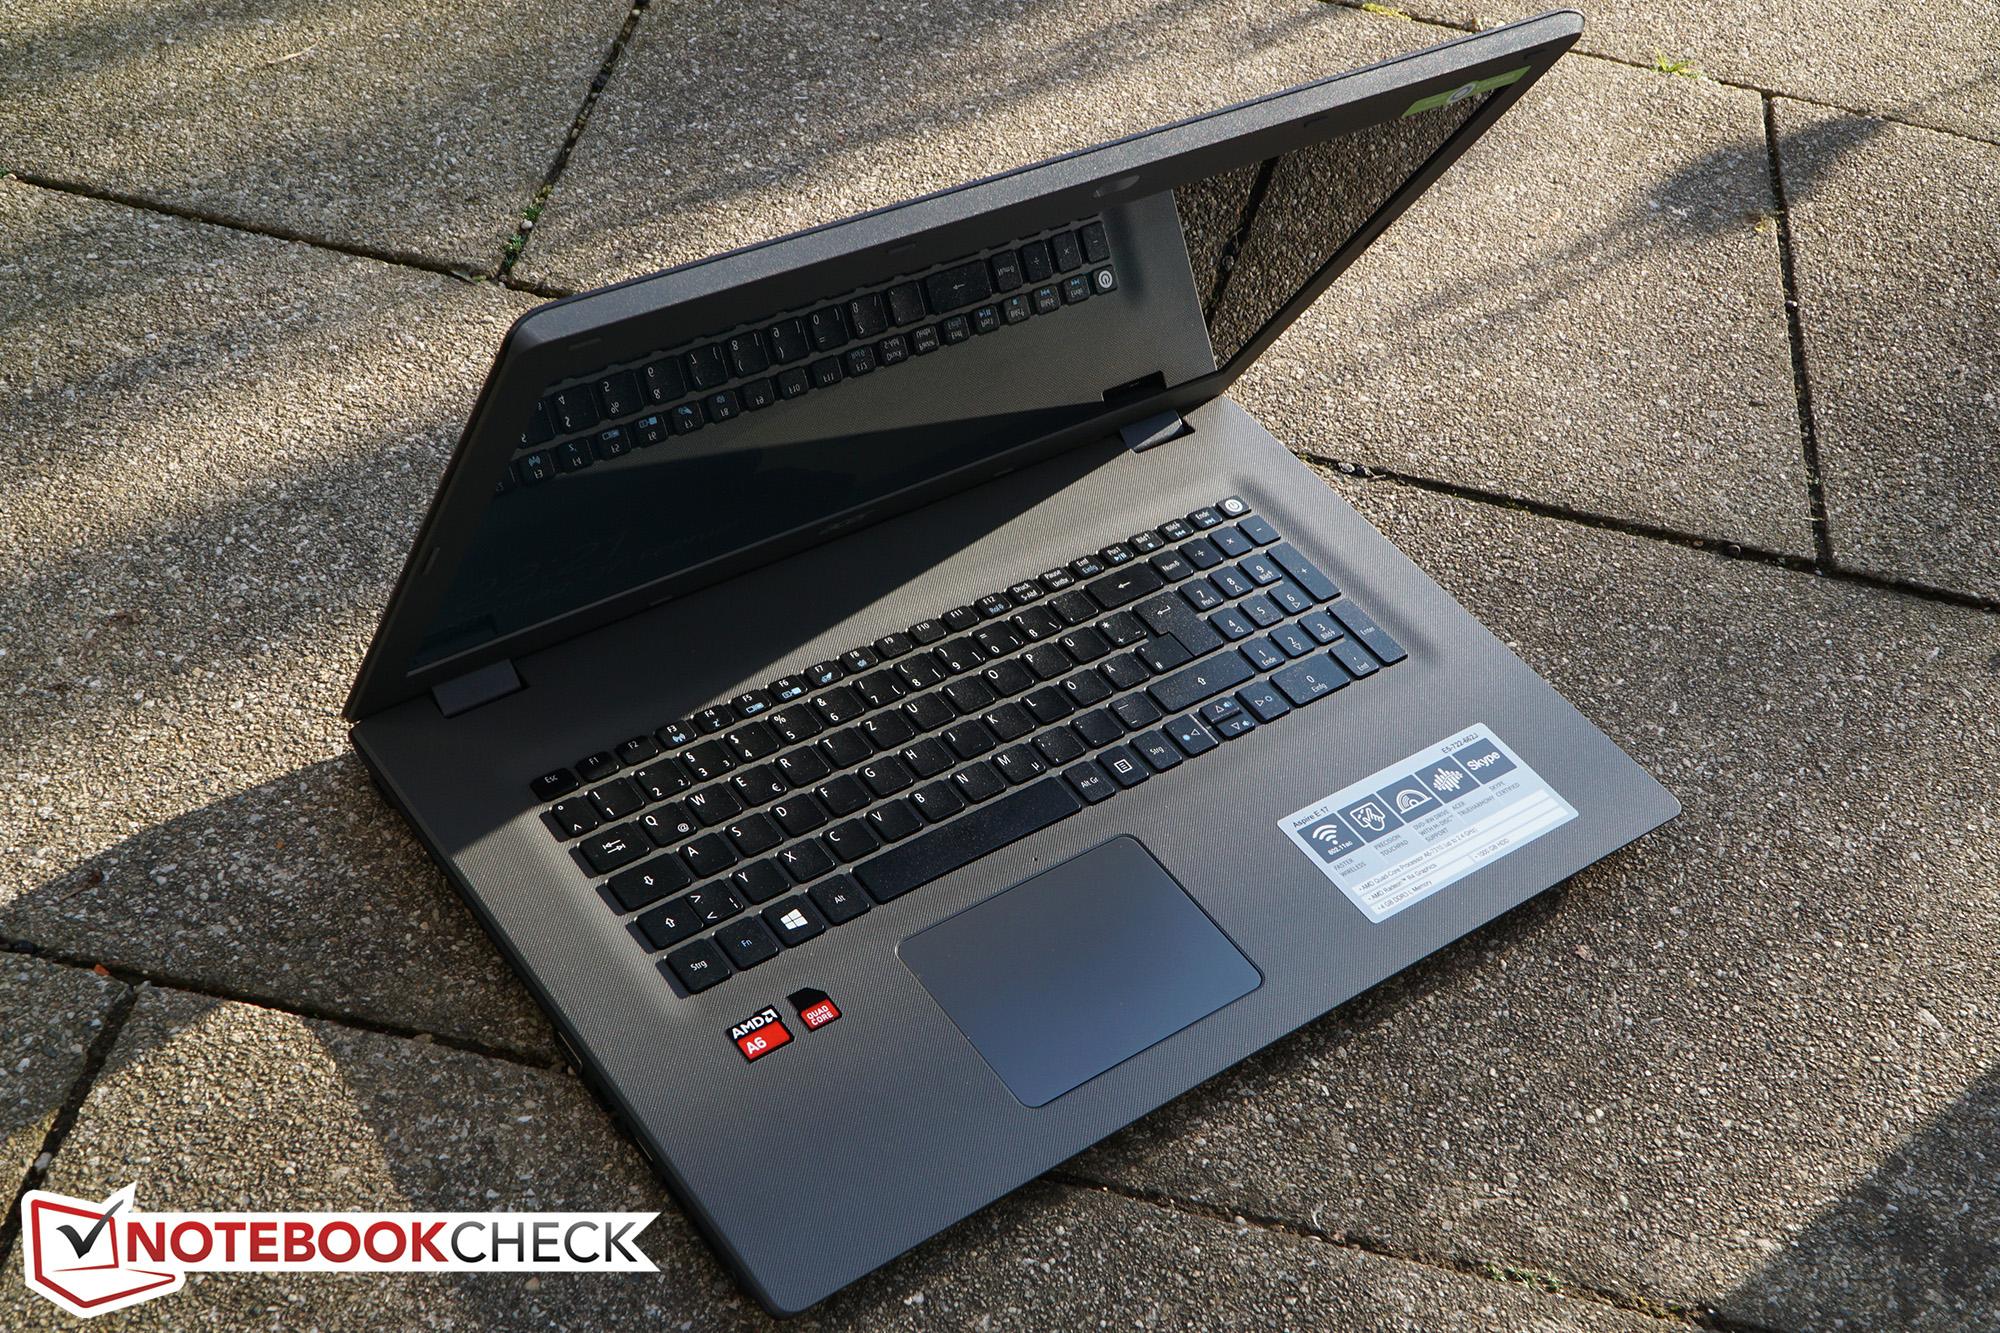 Acer Aspire E5-722 Realtek LAN Drivers Mac